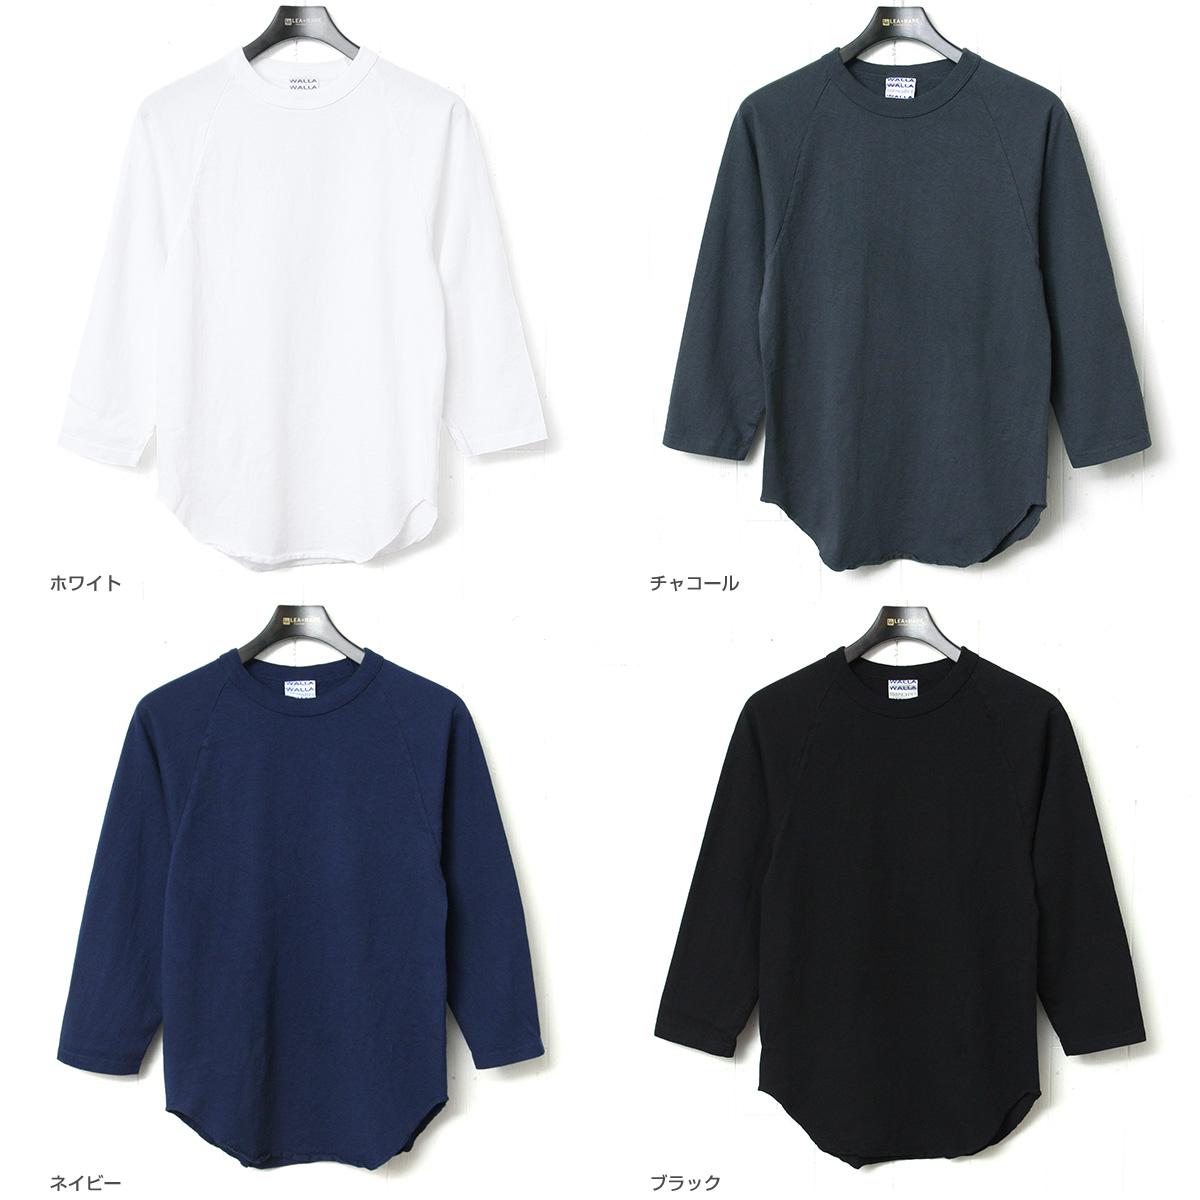 WALLA WALLA SPORT ワラワラスポーツ 7分袖ベースボールTシャツ 日本製